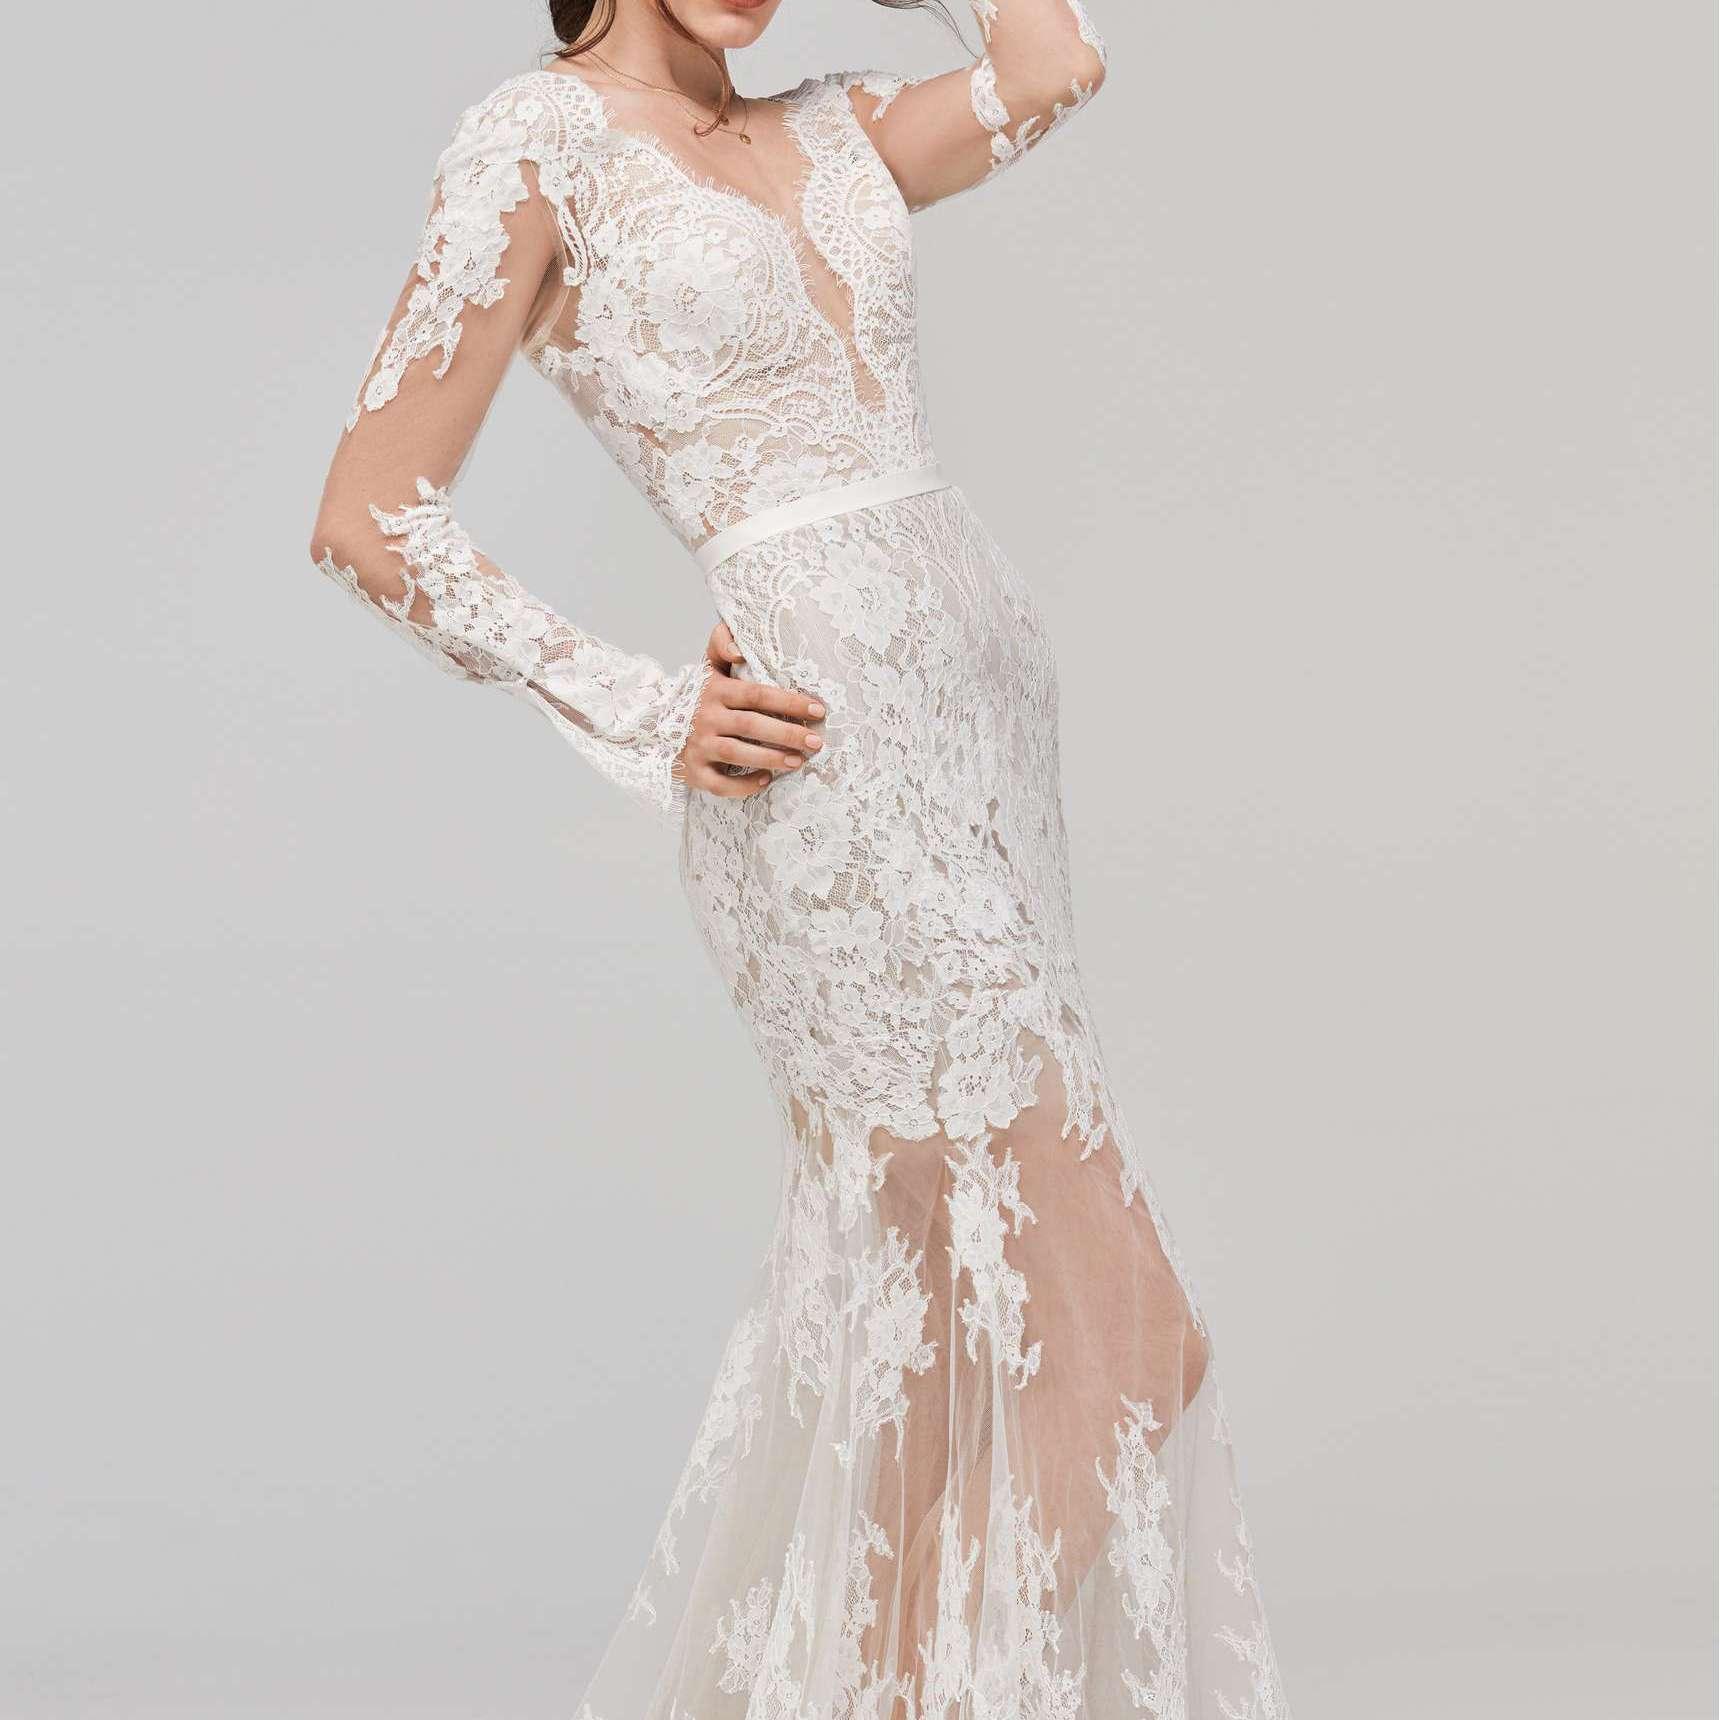 Nordstrom Wedding Dresses.33 Tasteful Illusion Wedding Dresses For Daring Brides